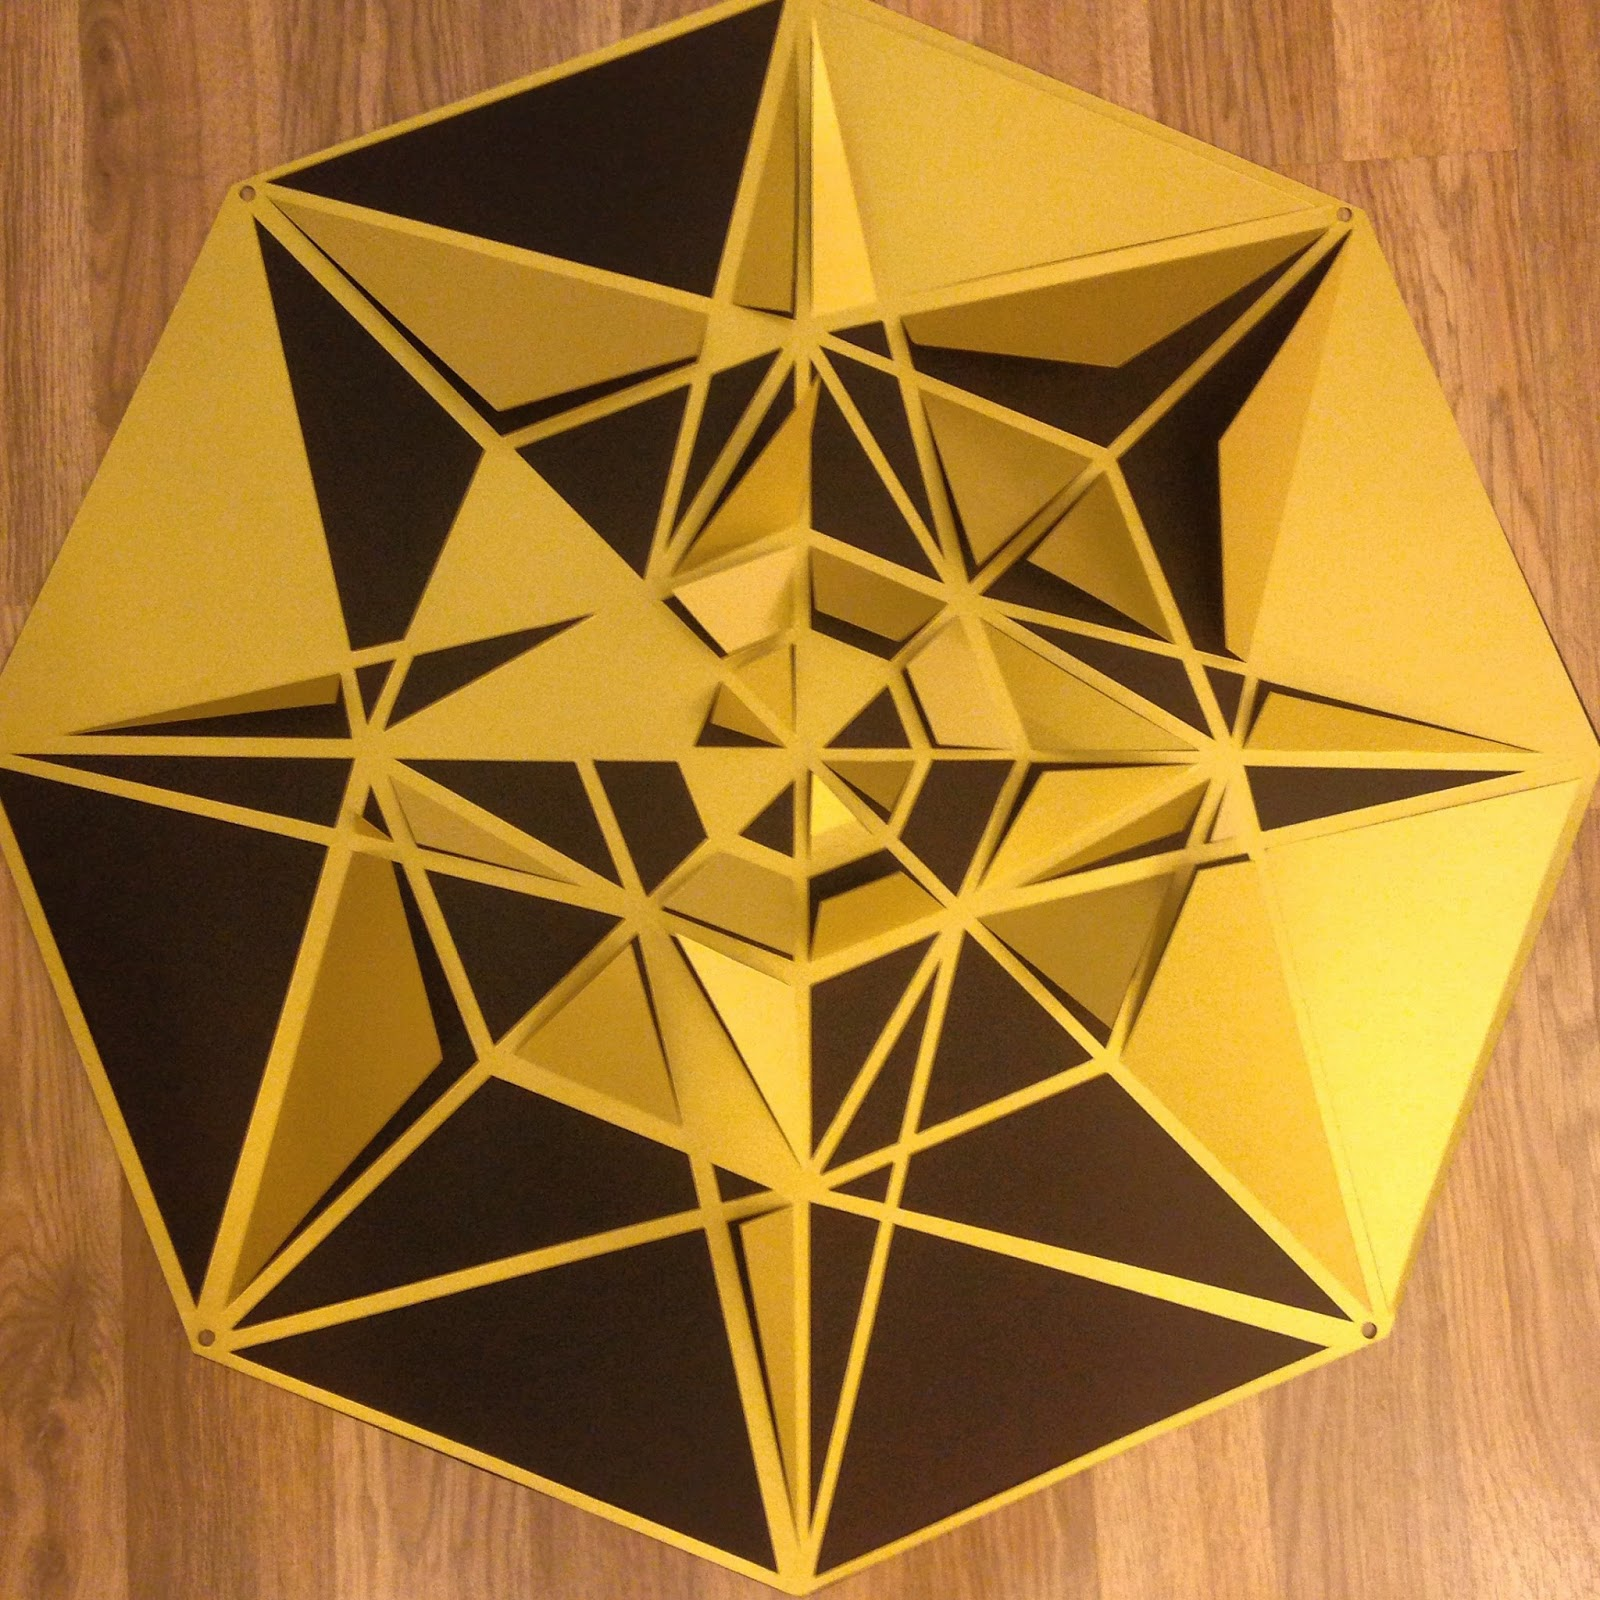 Black and gold geometric papercut wreath